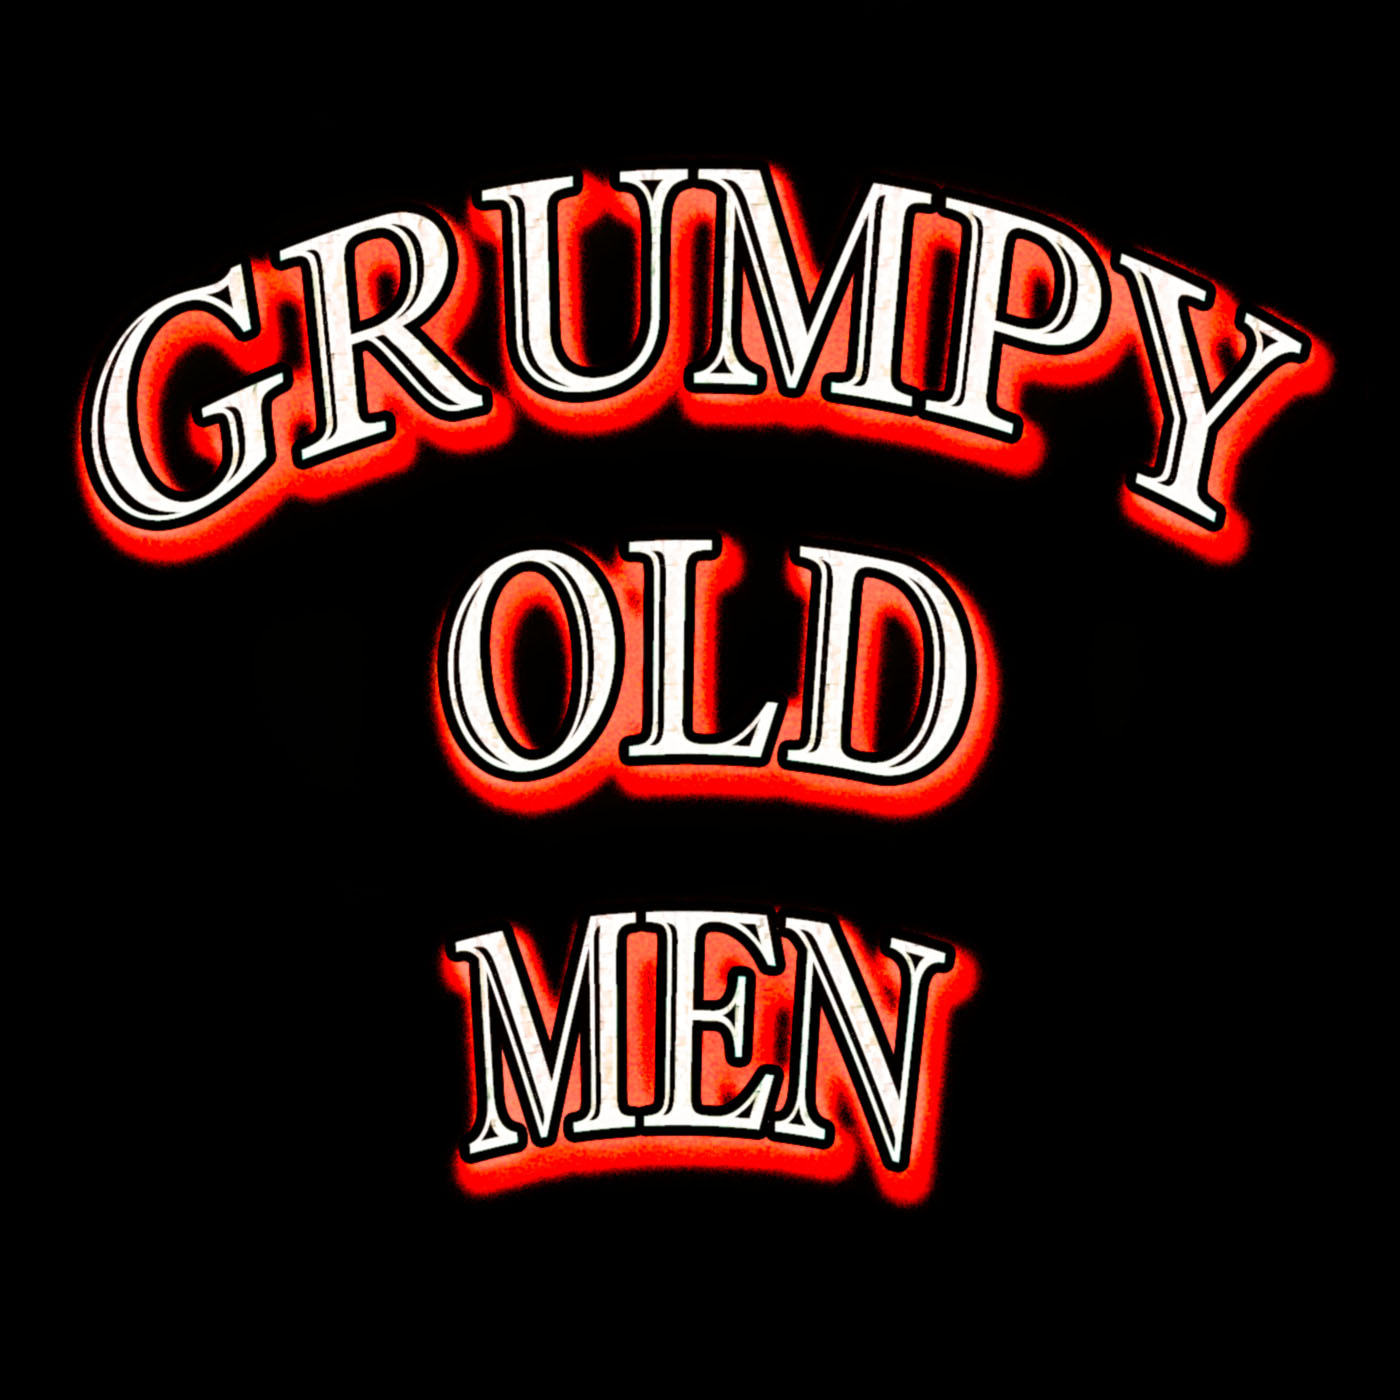 Grumpy Old Men show image